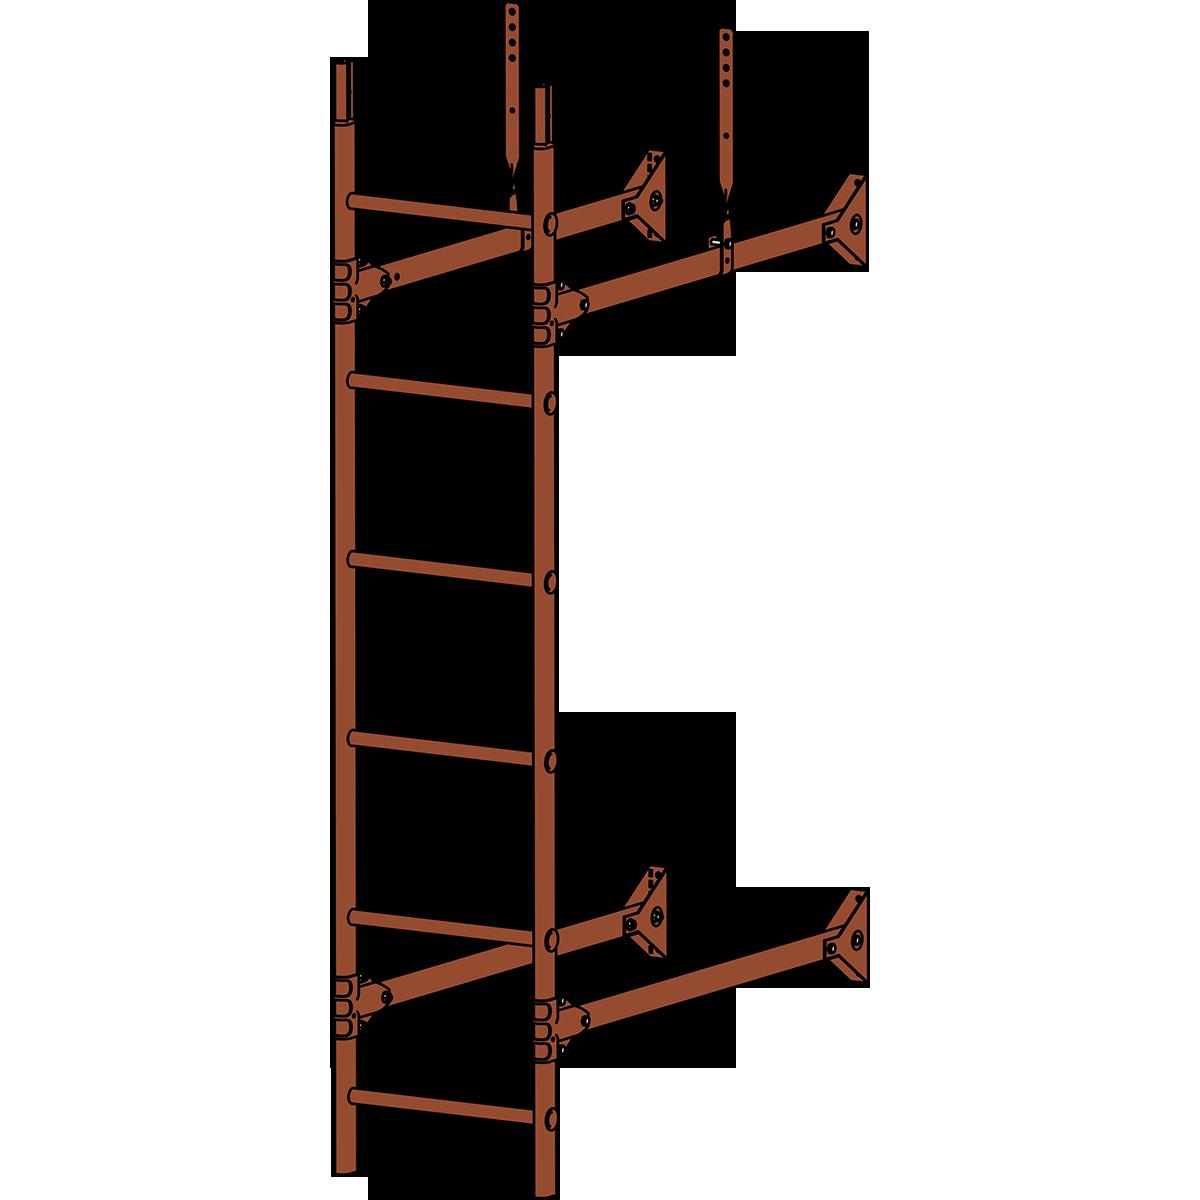 Лестница стеновая ROOFSYSTEMS PRESTIGE ZN 3м RAL 8004 Коричневая медь